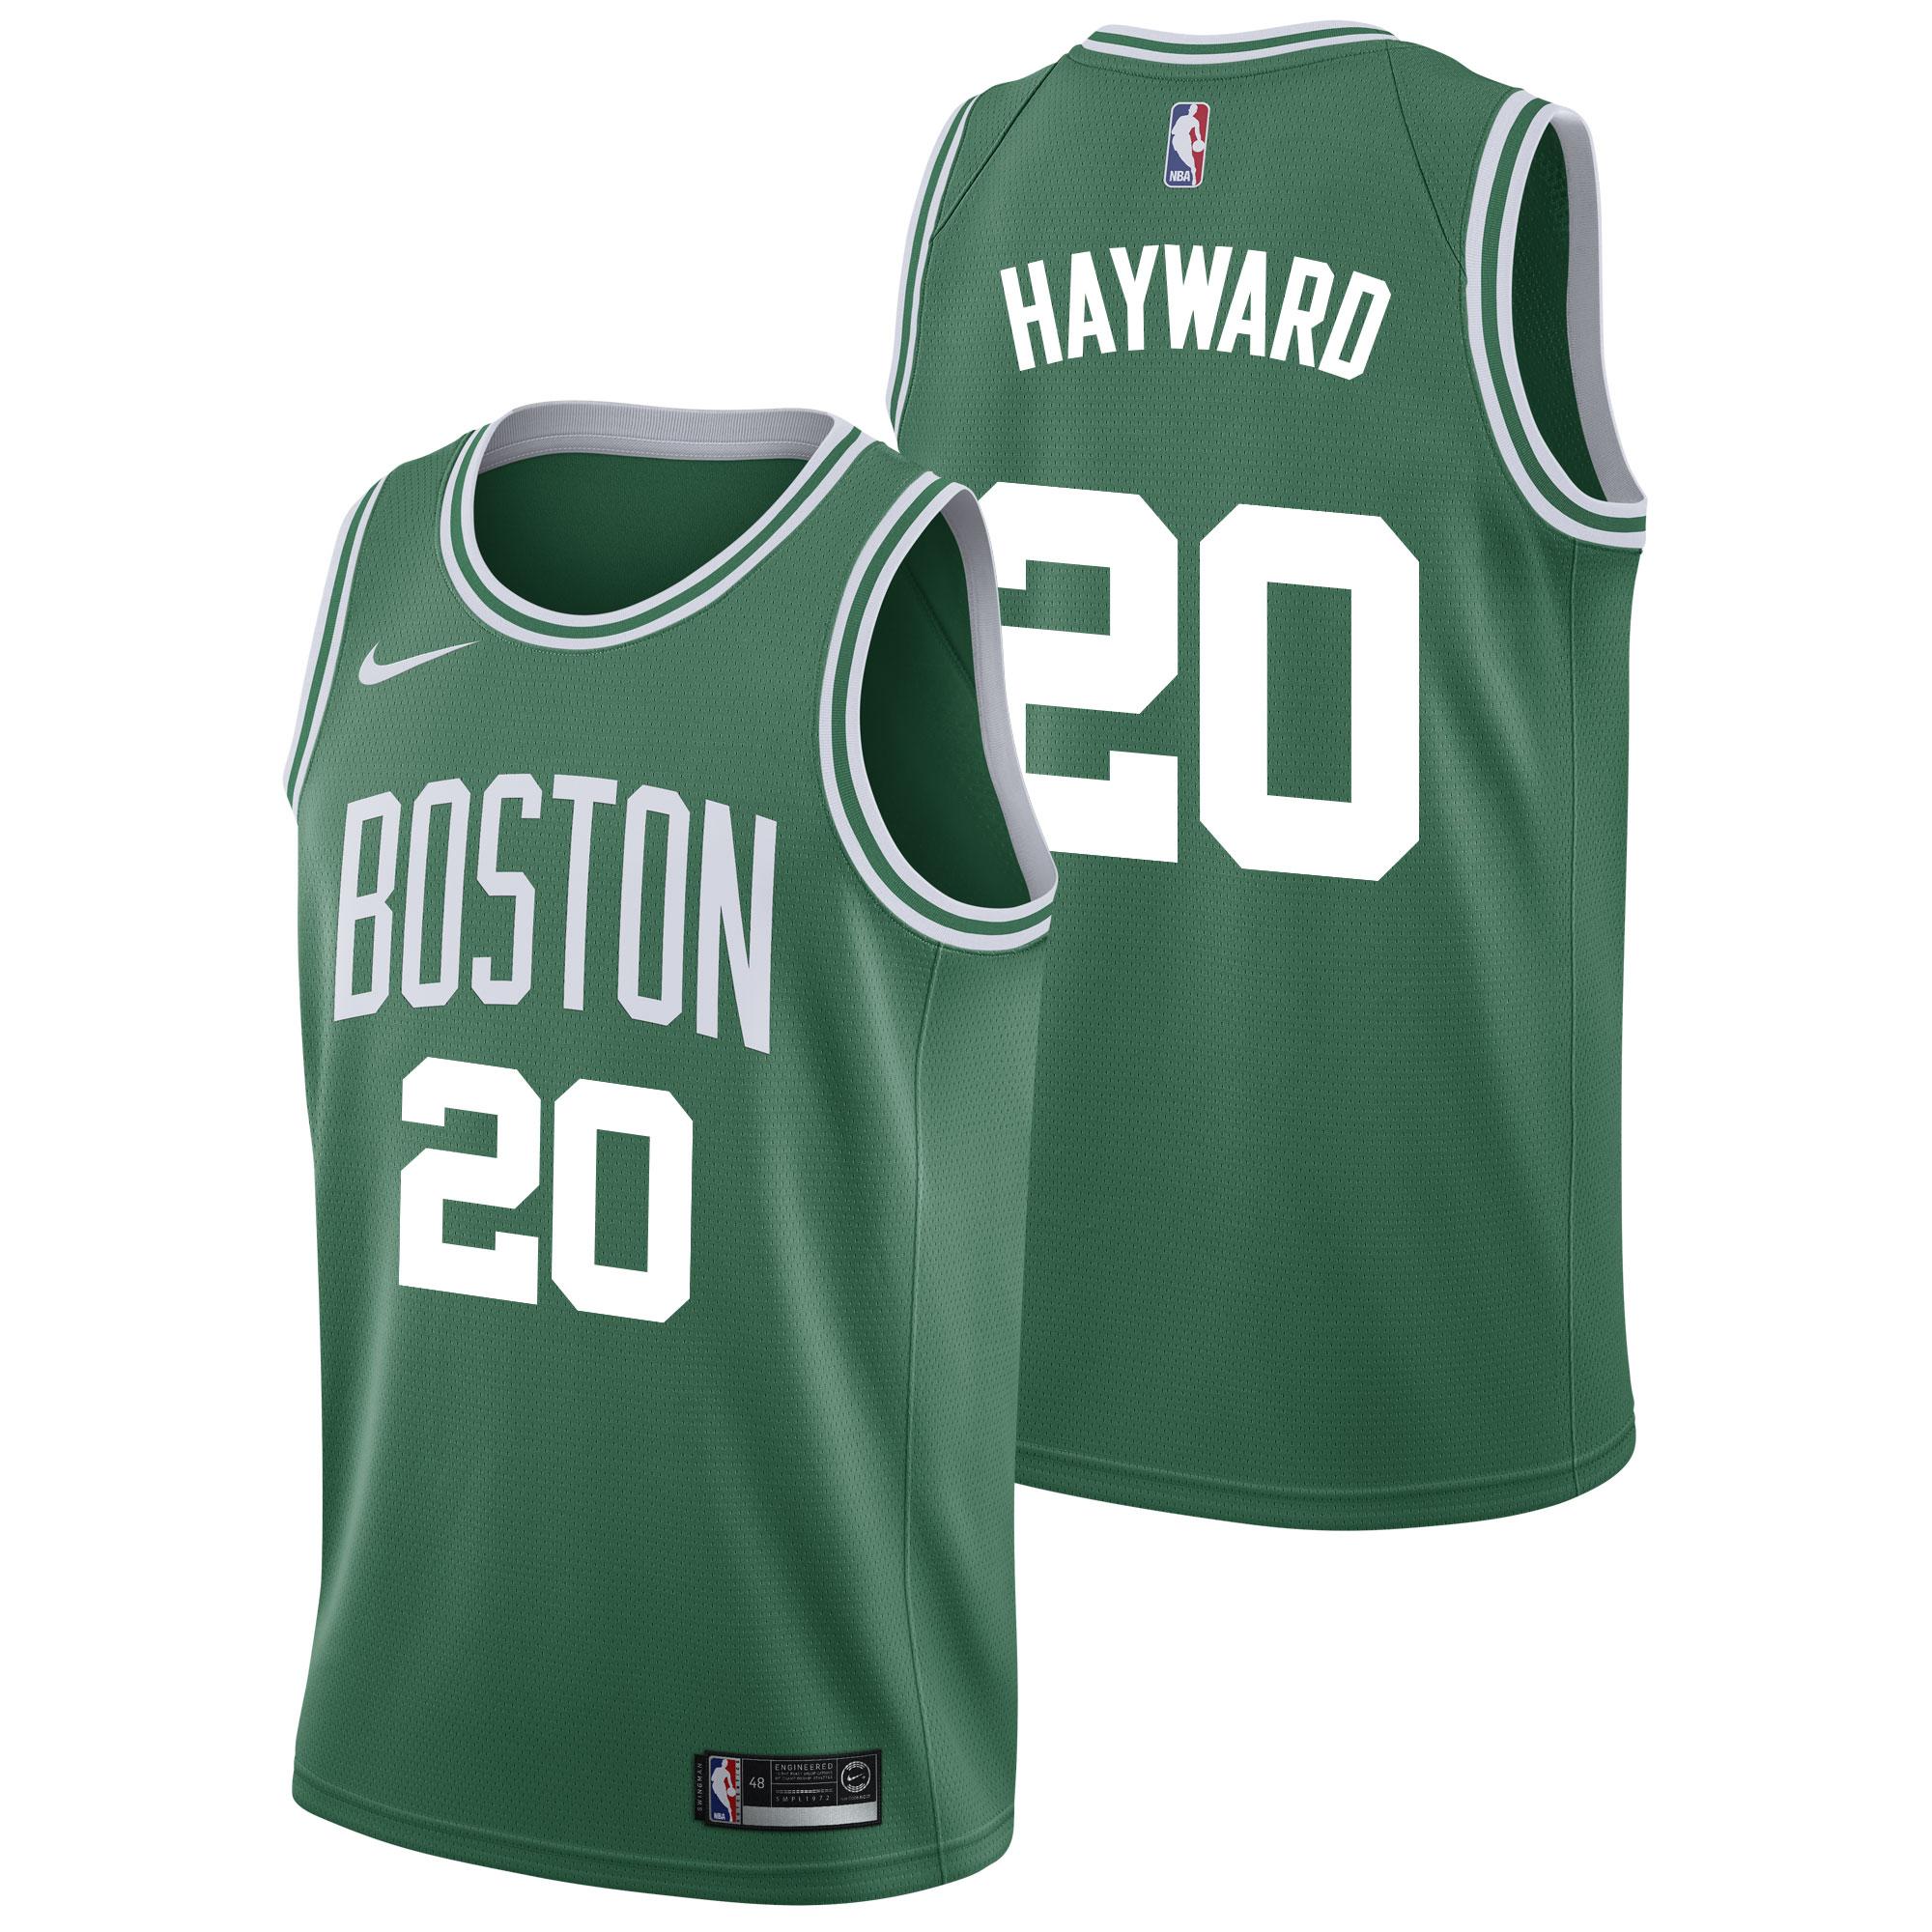 """Boston Celtics Nike Icon Swingman Jersey - Gordon Hayward - Mens"""